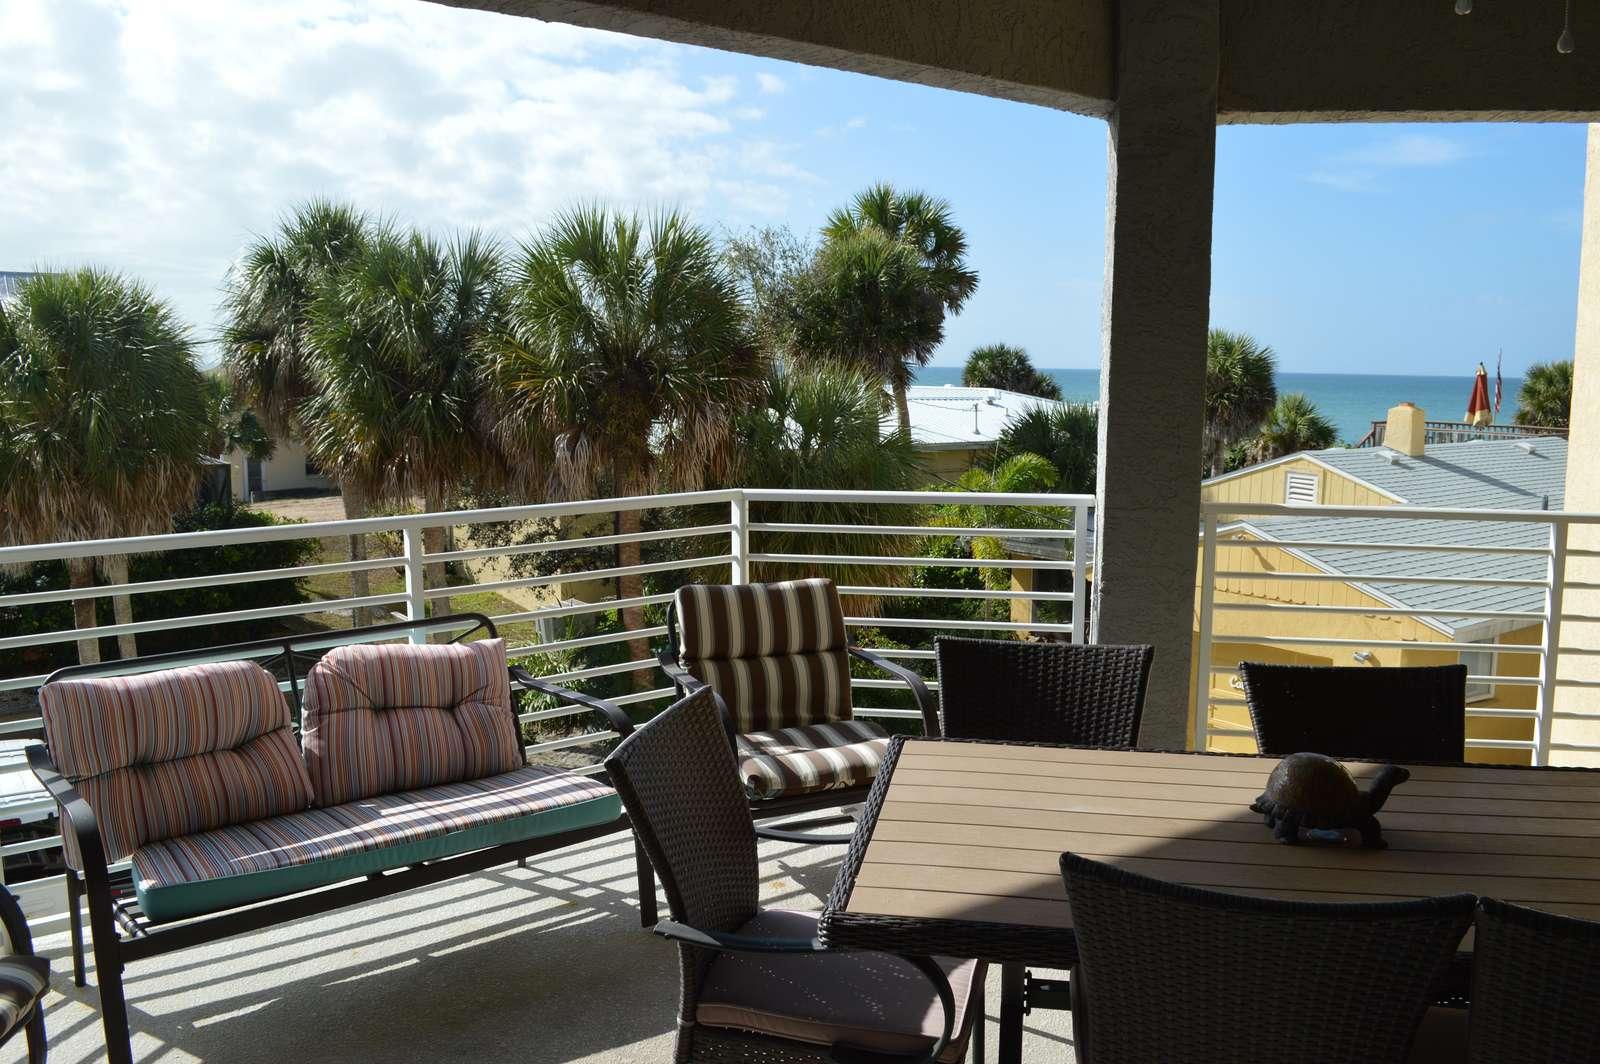 Englewood Beach Condo B   Englewood Beach Vacation Rentals